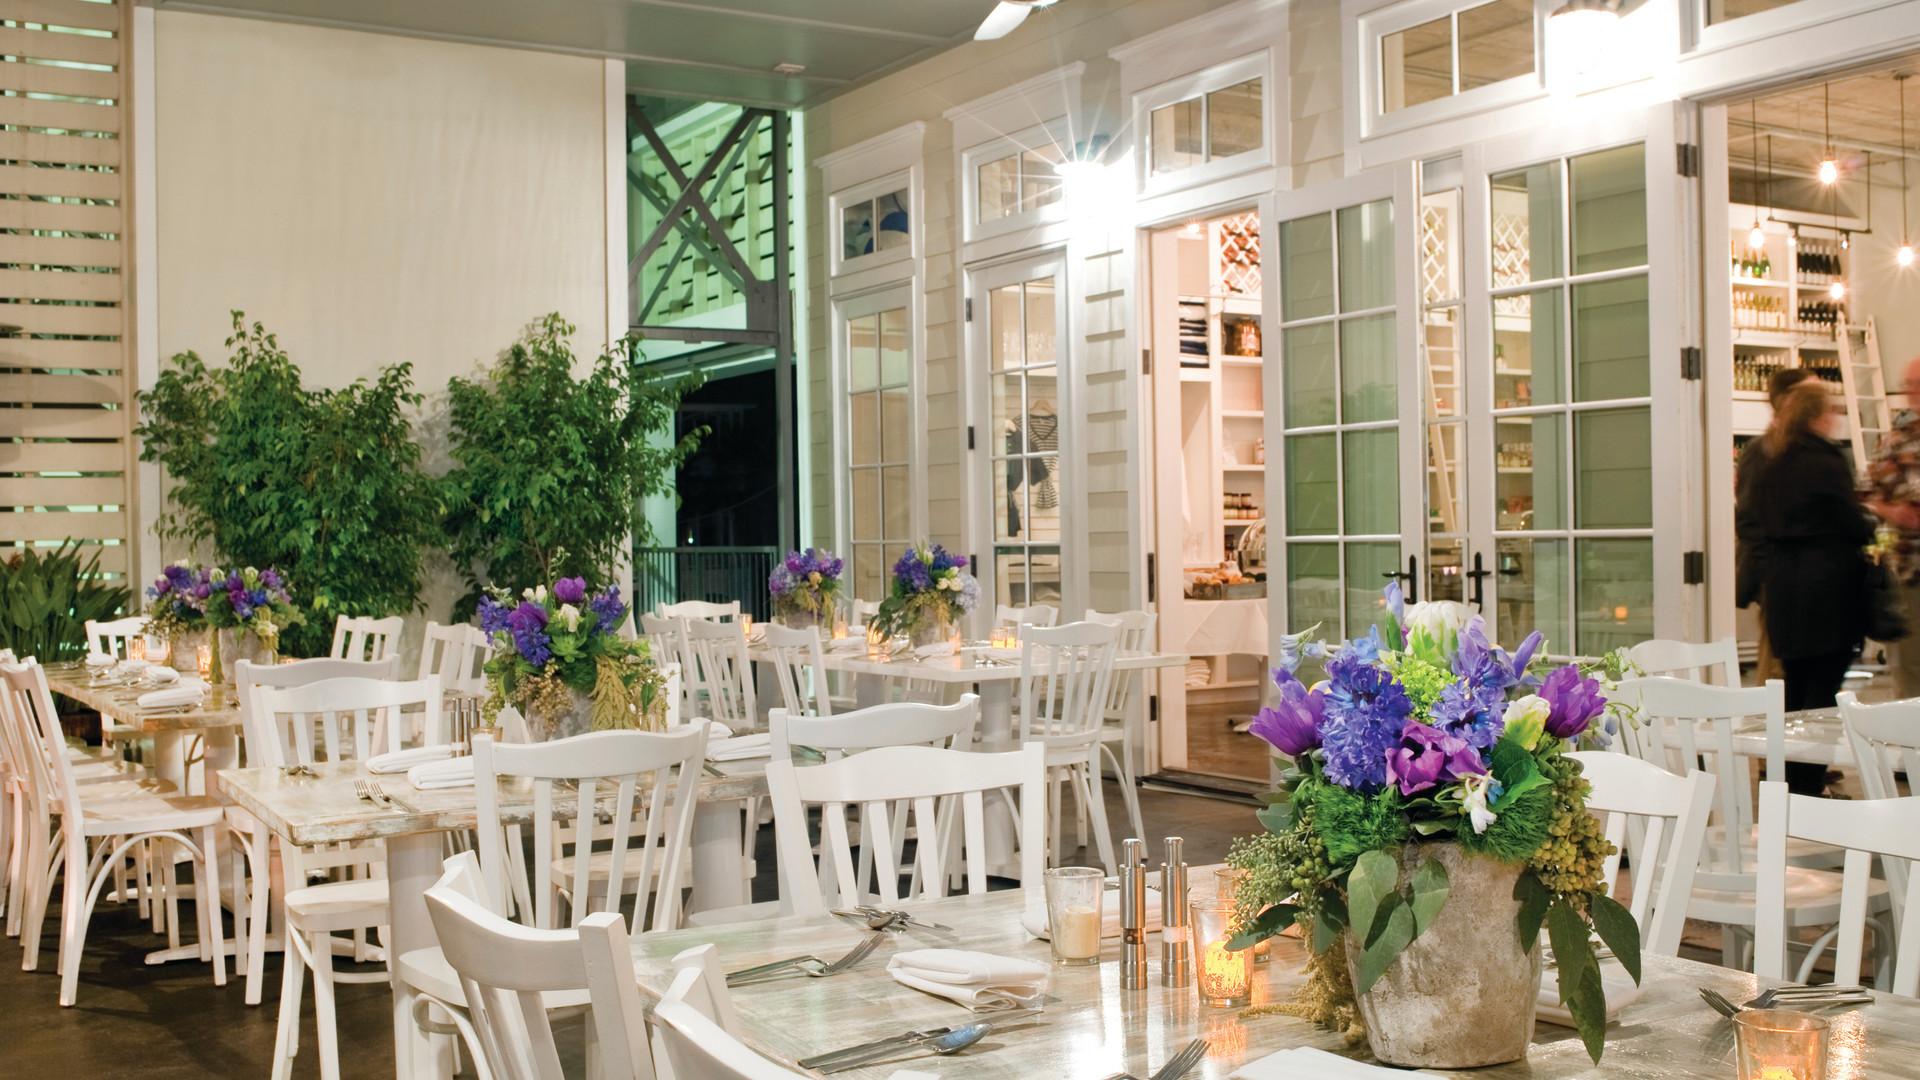 Porch Cafe Backdrop16.jpg